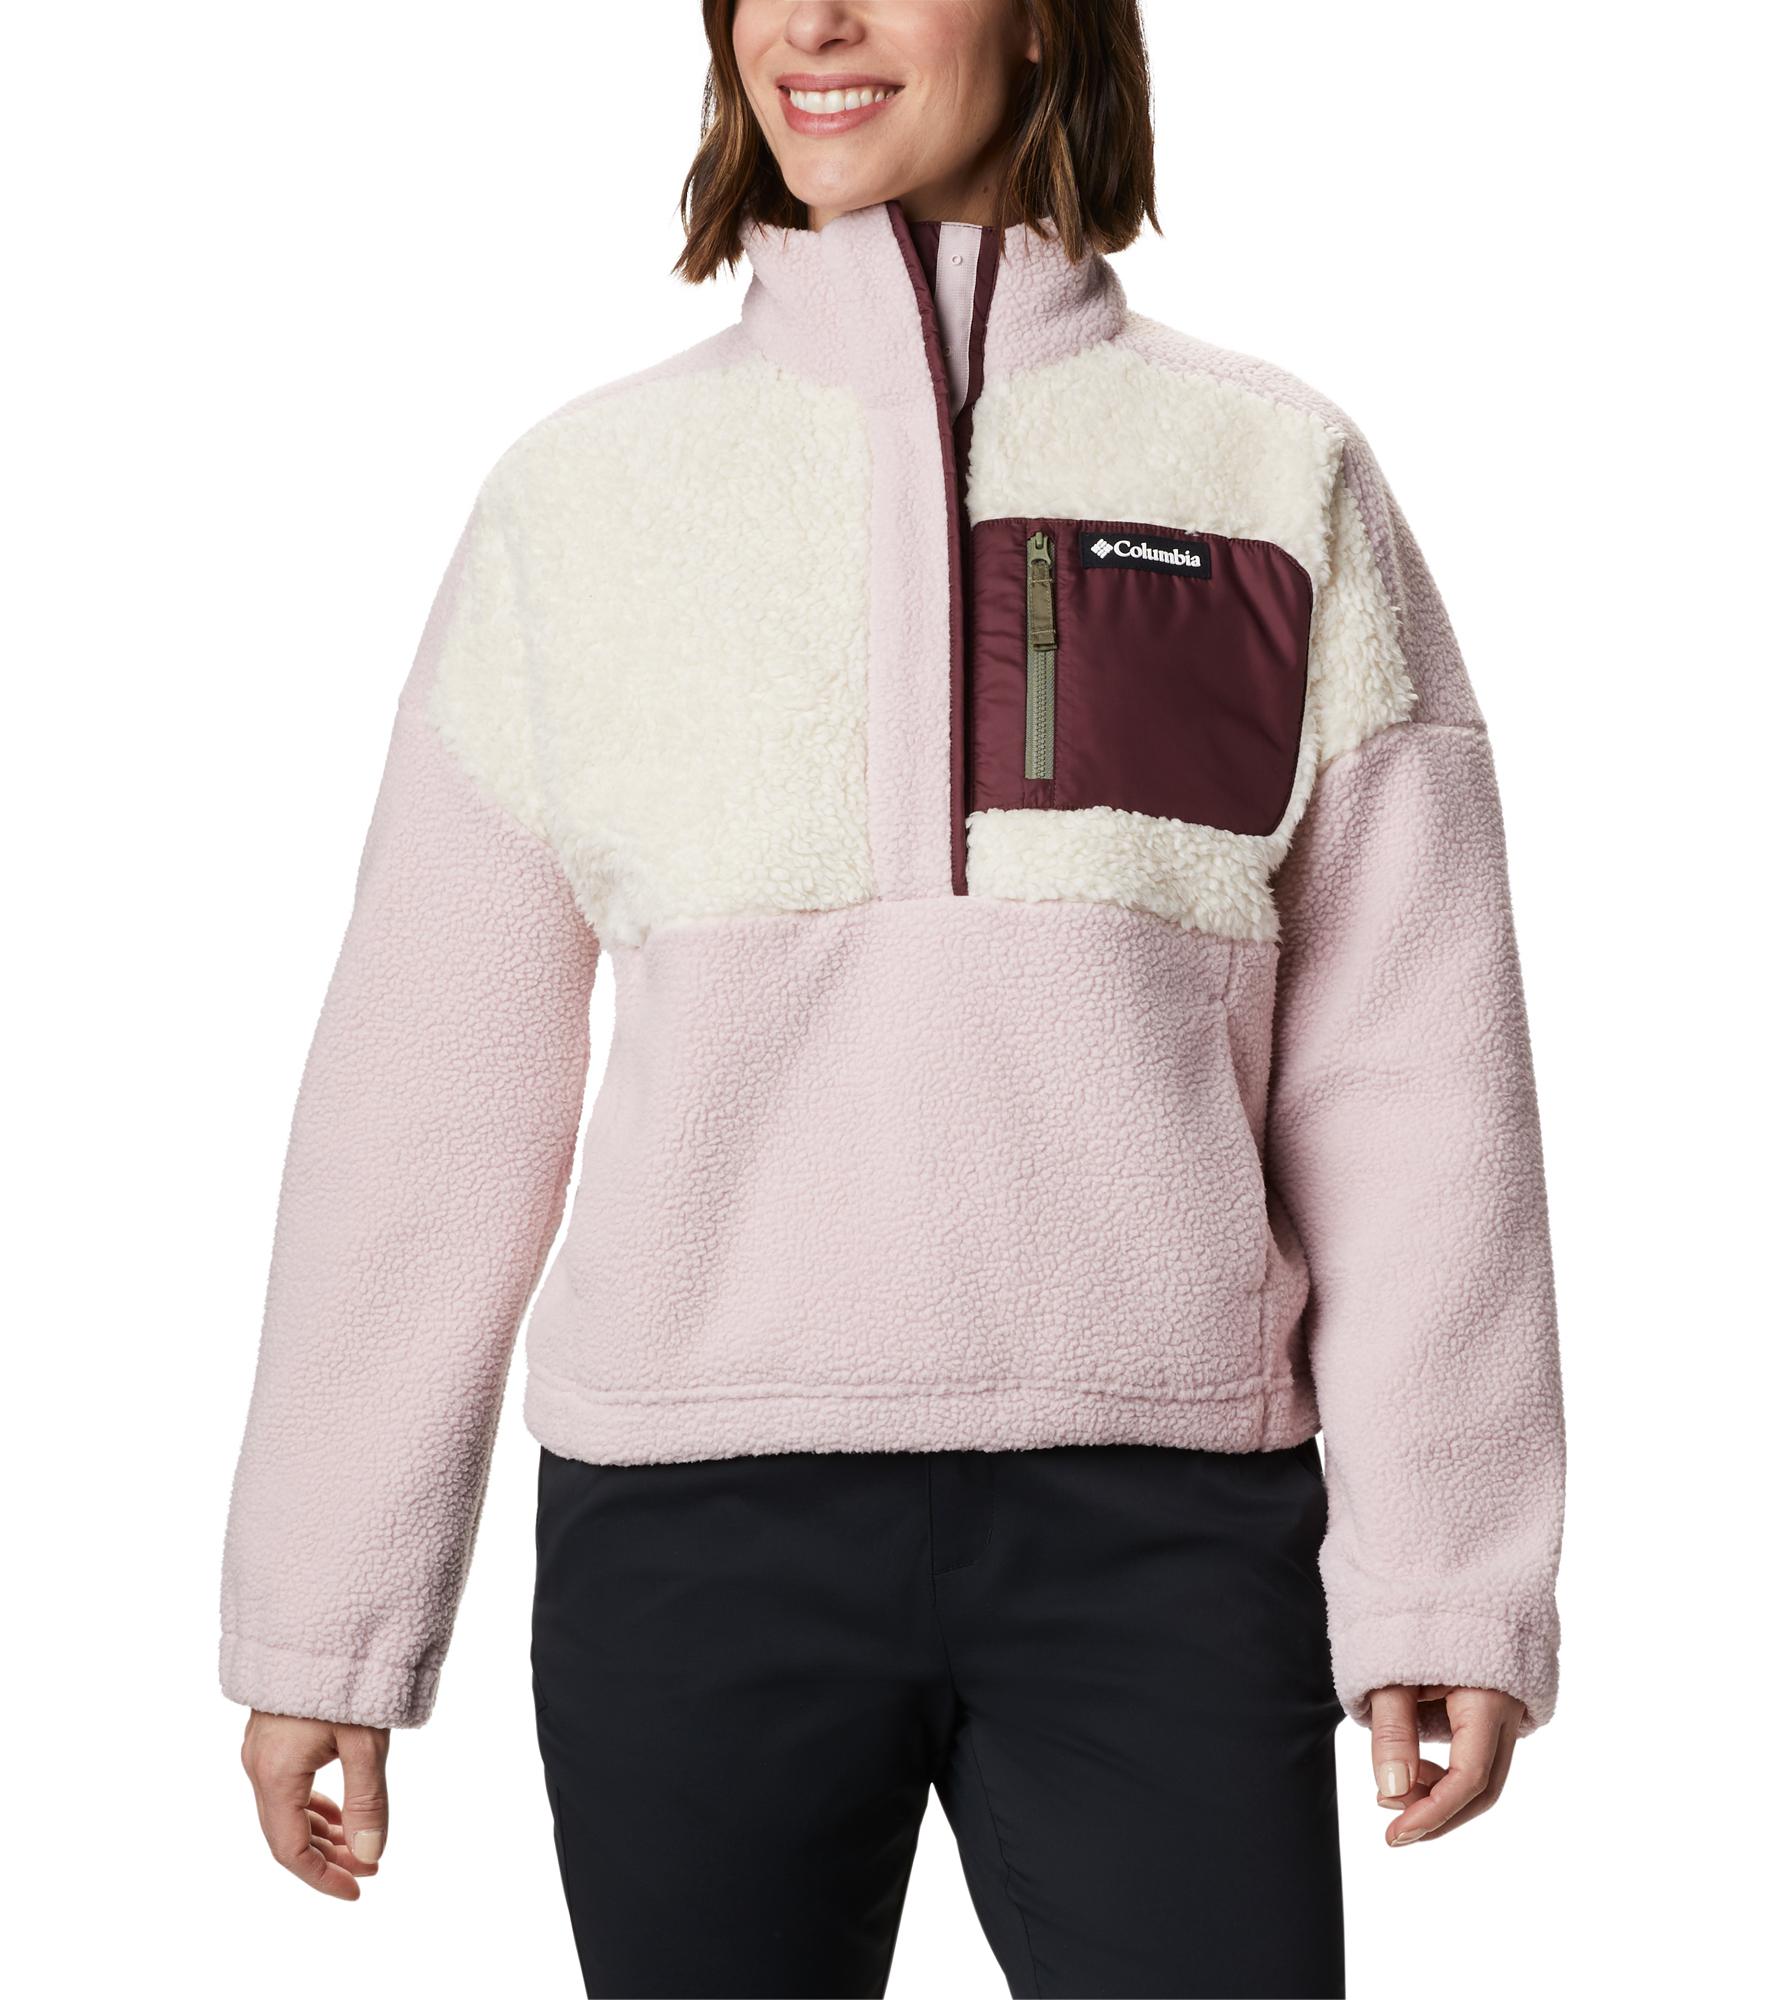 Columbia Джемпер флисовый женский Columbia Lodge™, размер 42 columbia джемпер флисовый женский columbia exploration™ fleece crew размер 44